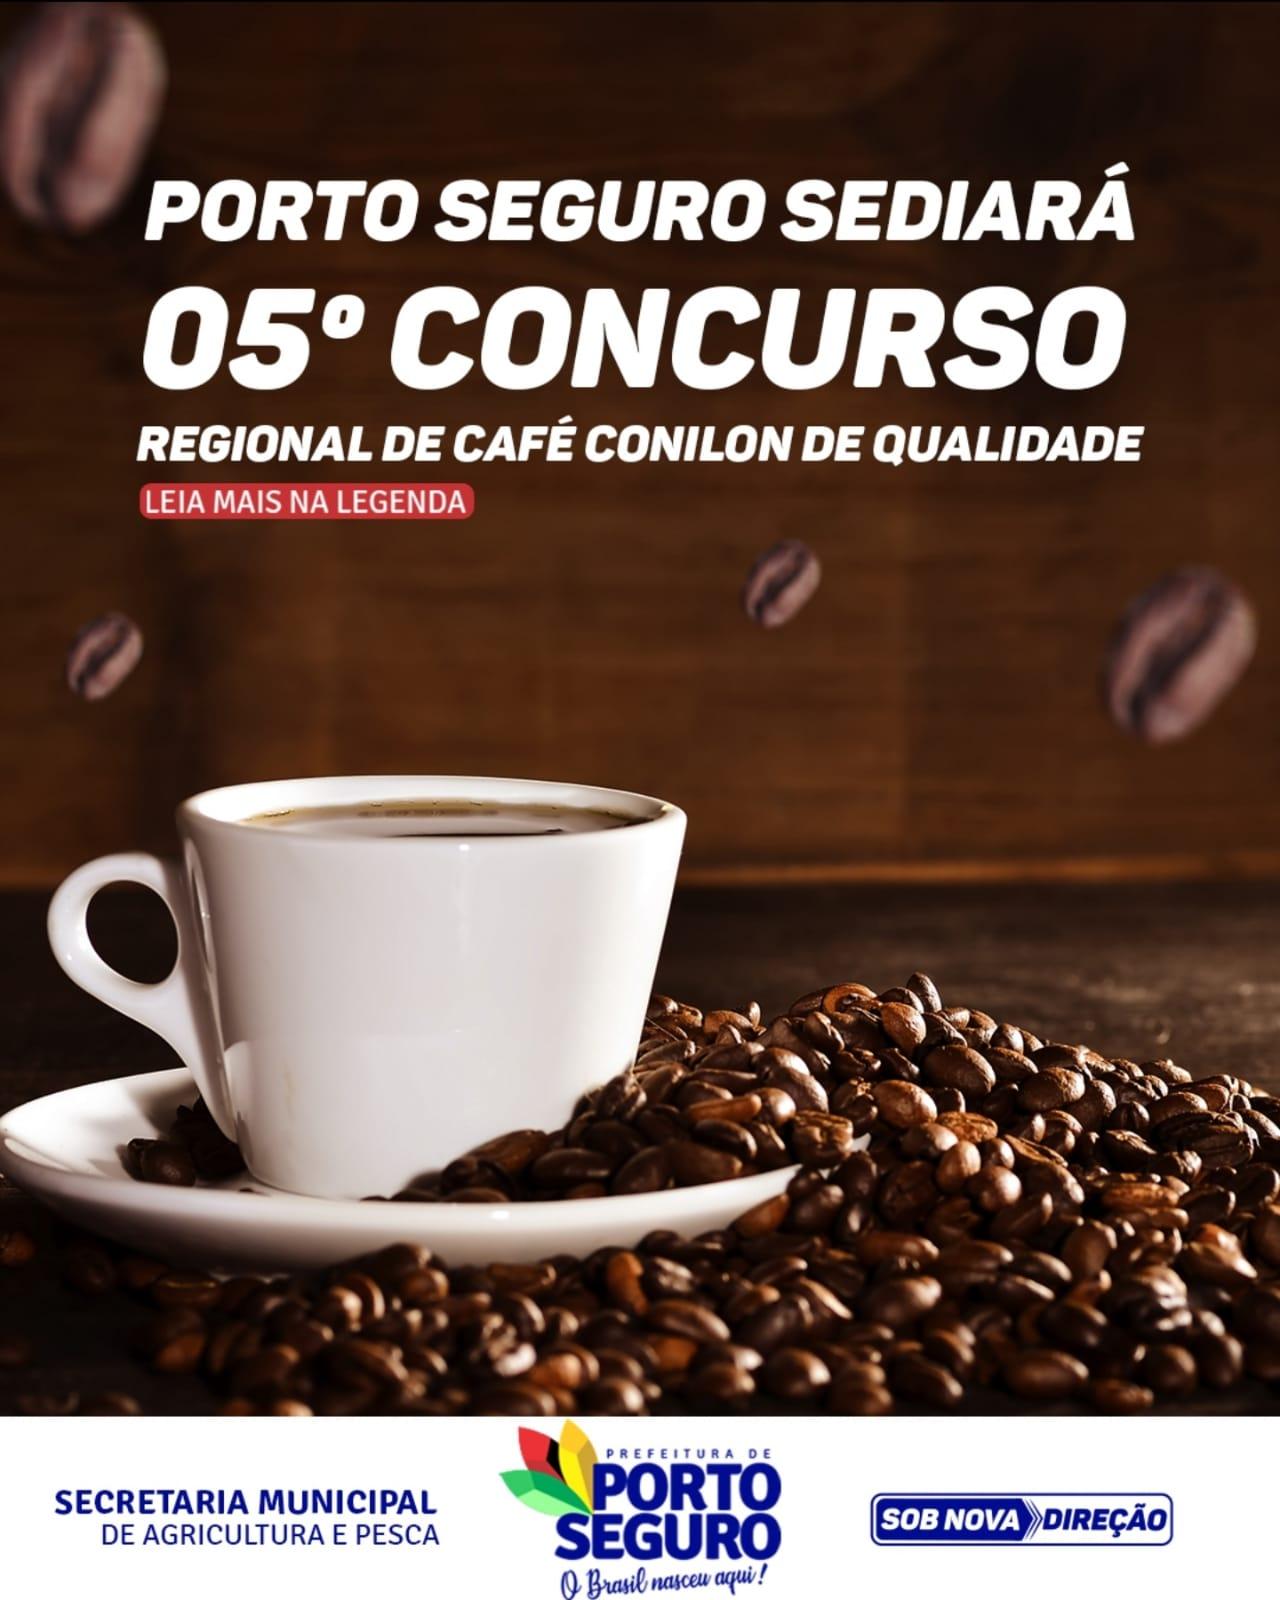 Porto Seguro sediará concurso regional de café conilon 18